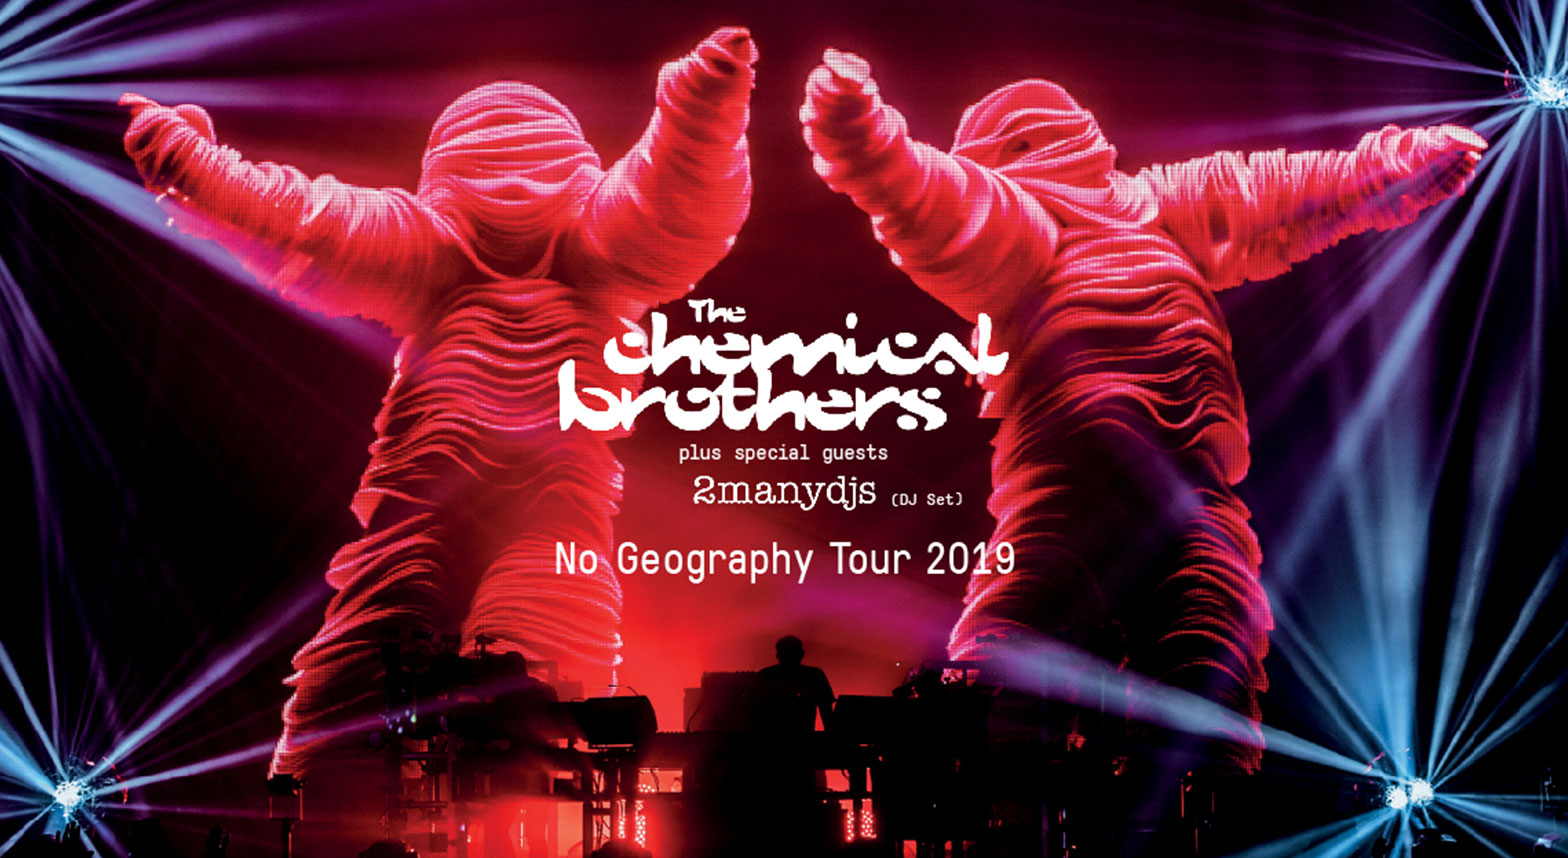 chemical-brothers-arenasV2.jpg